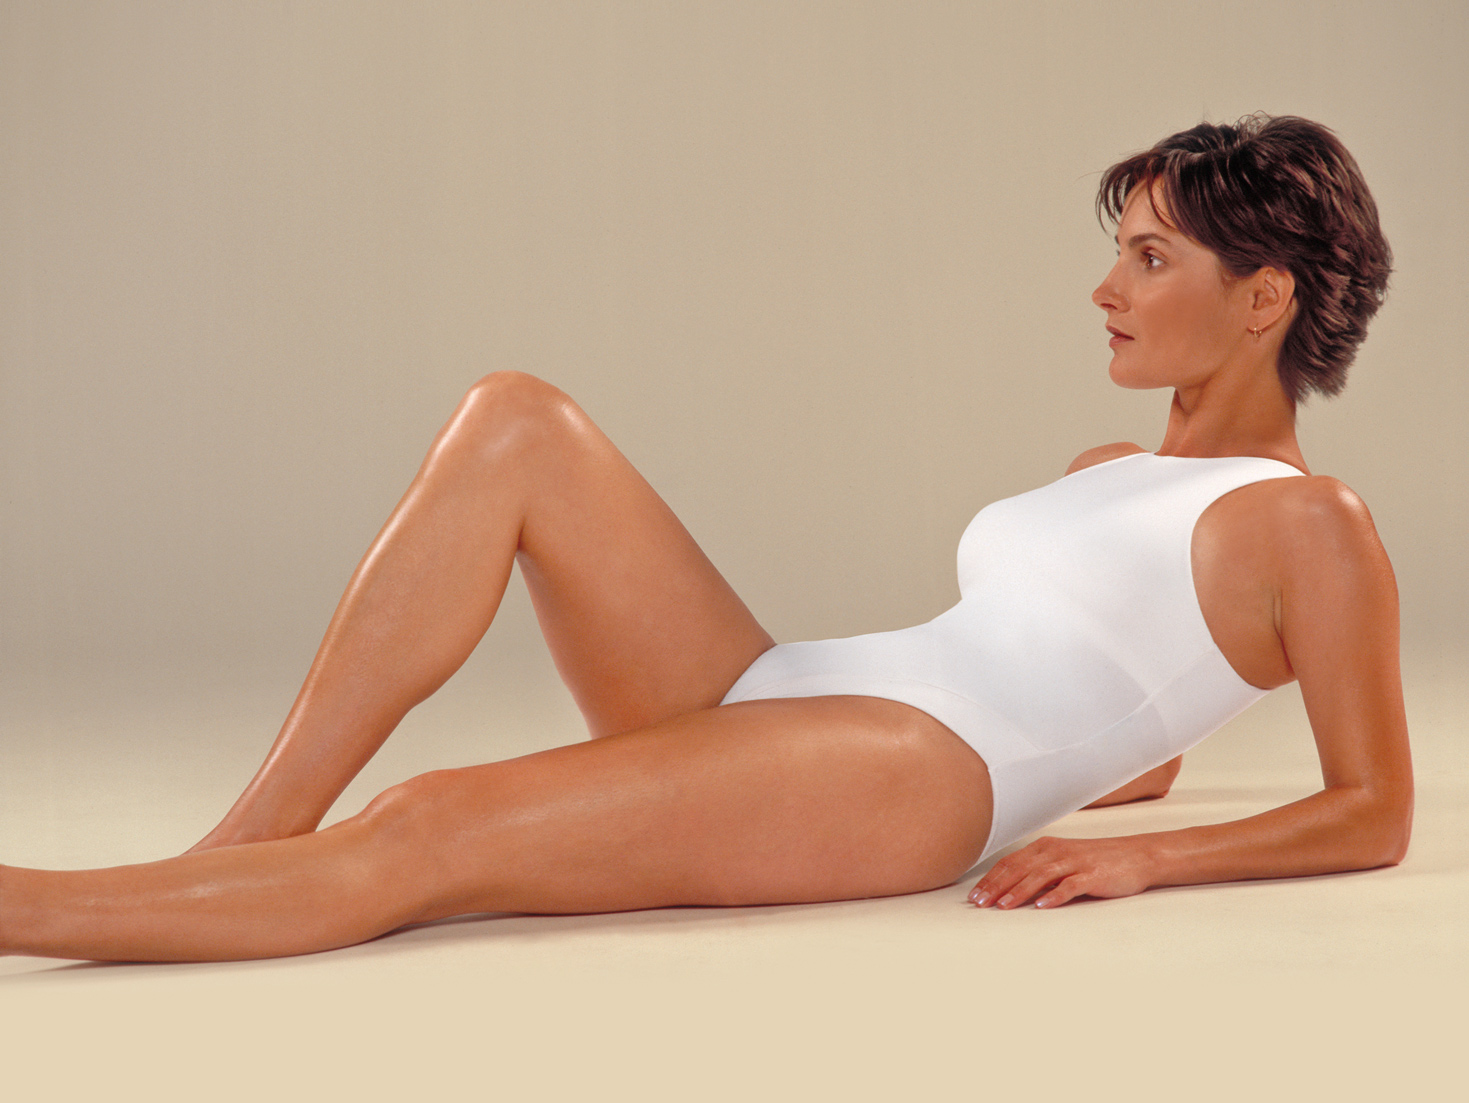 fashion model in swimsuit apparel